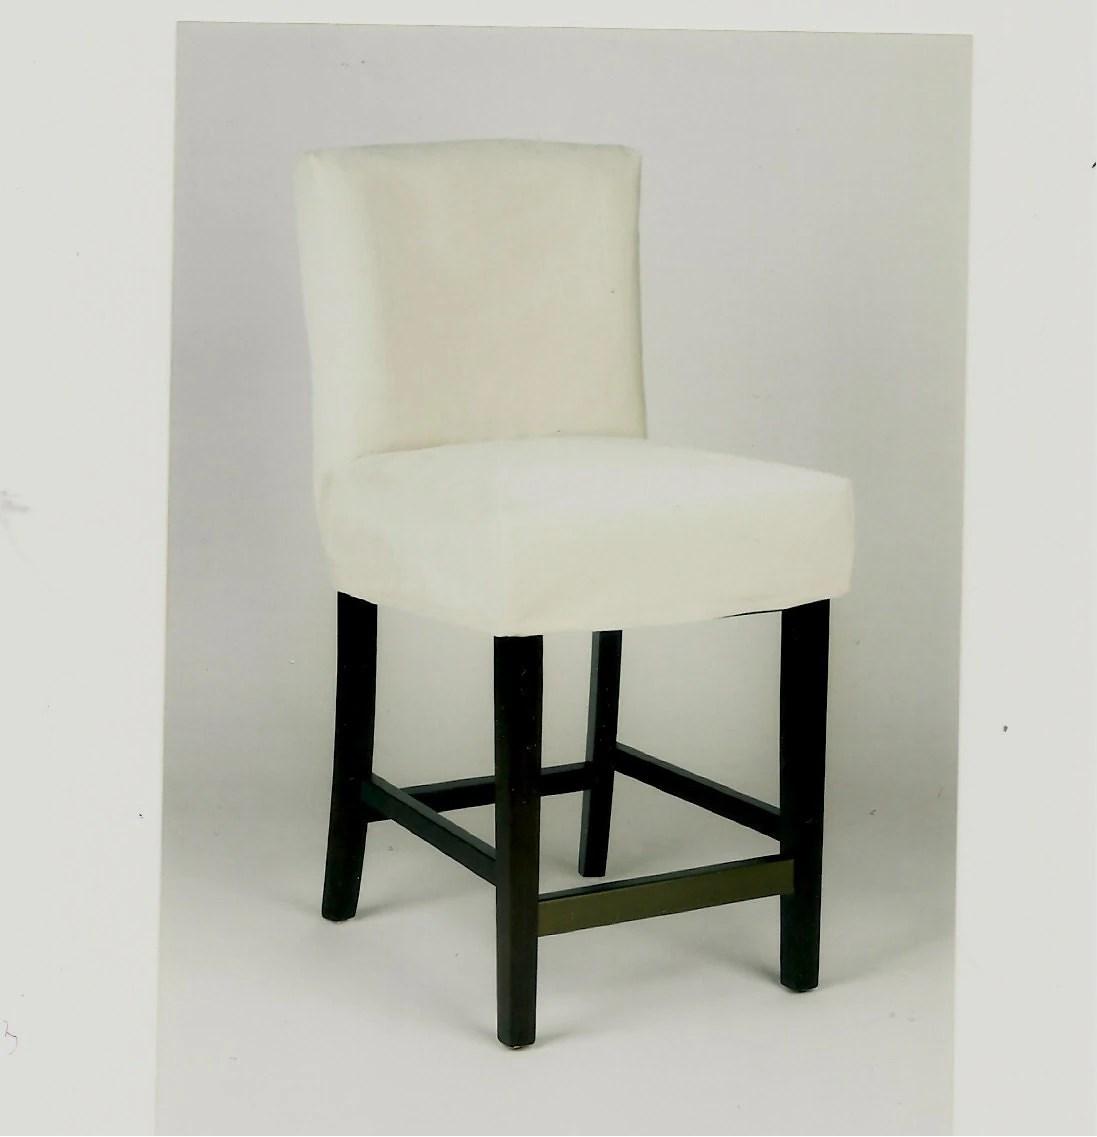 counter height chair slipcovers design names barstool slipcover